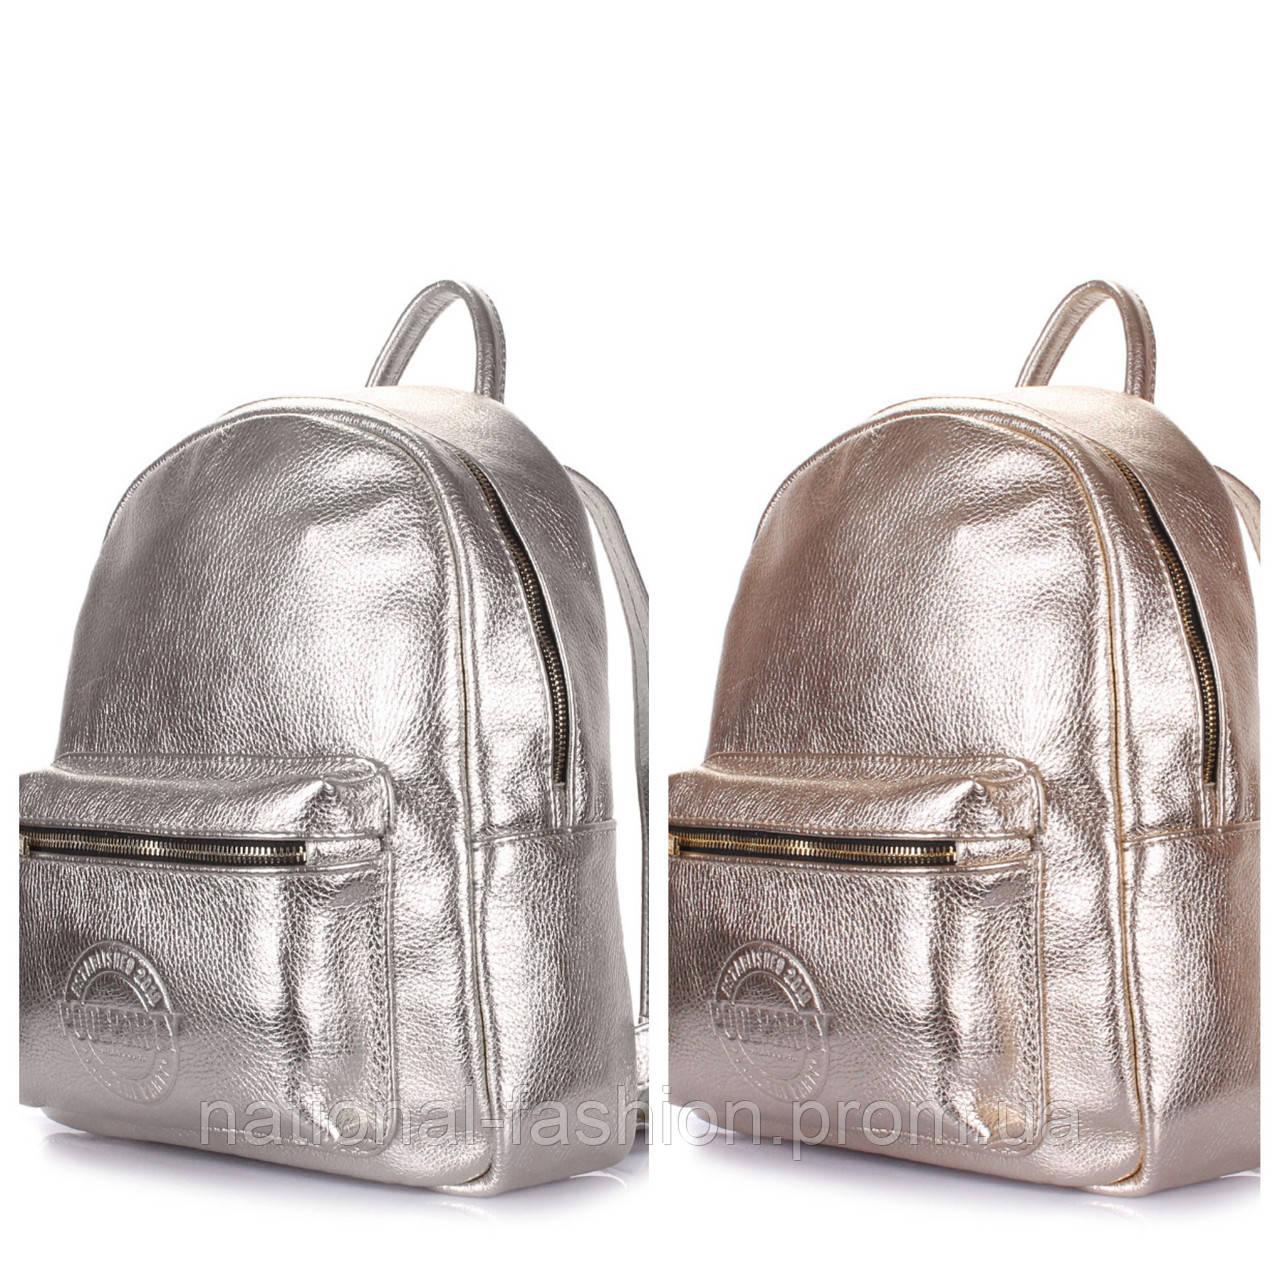 80ad66397b3a Рюкзак женский кожаный POOLPARTY Xs (золото\серебро): продажа, цена ...